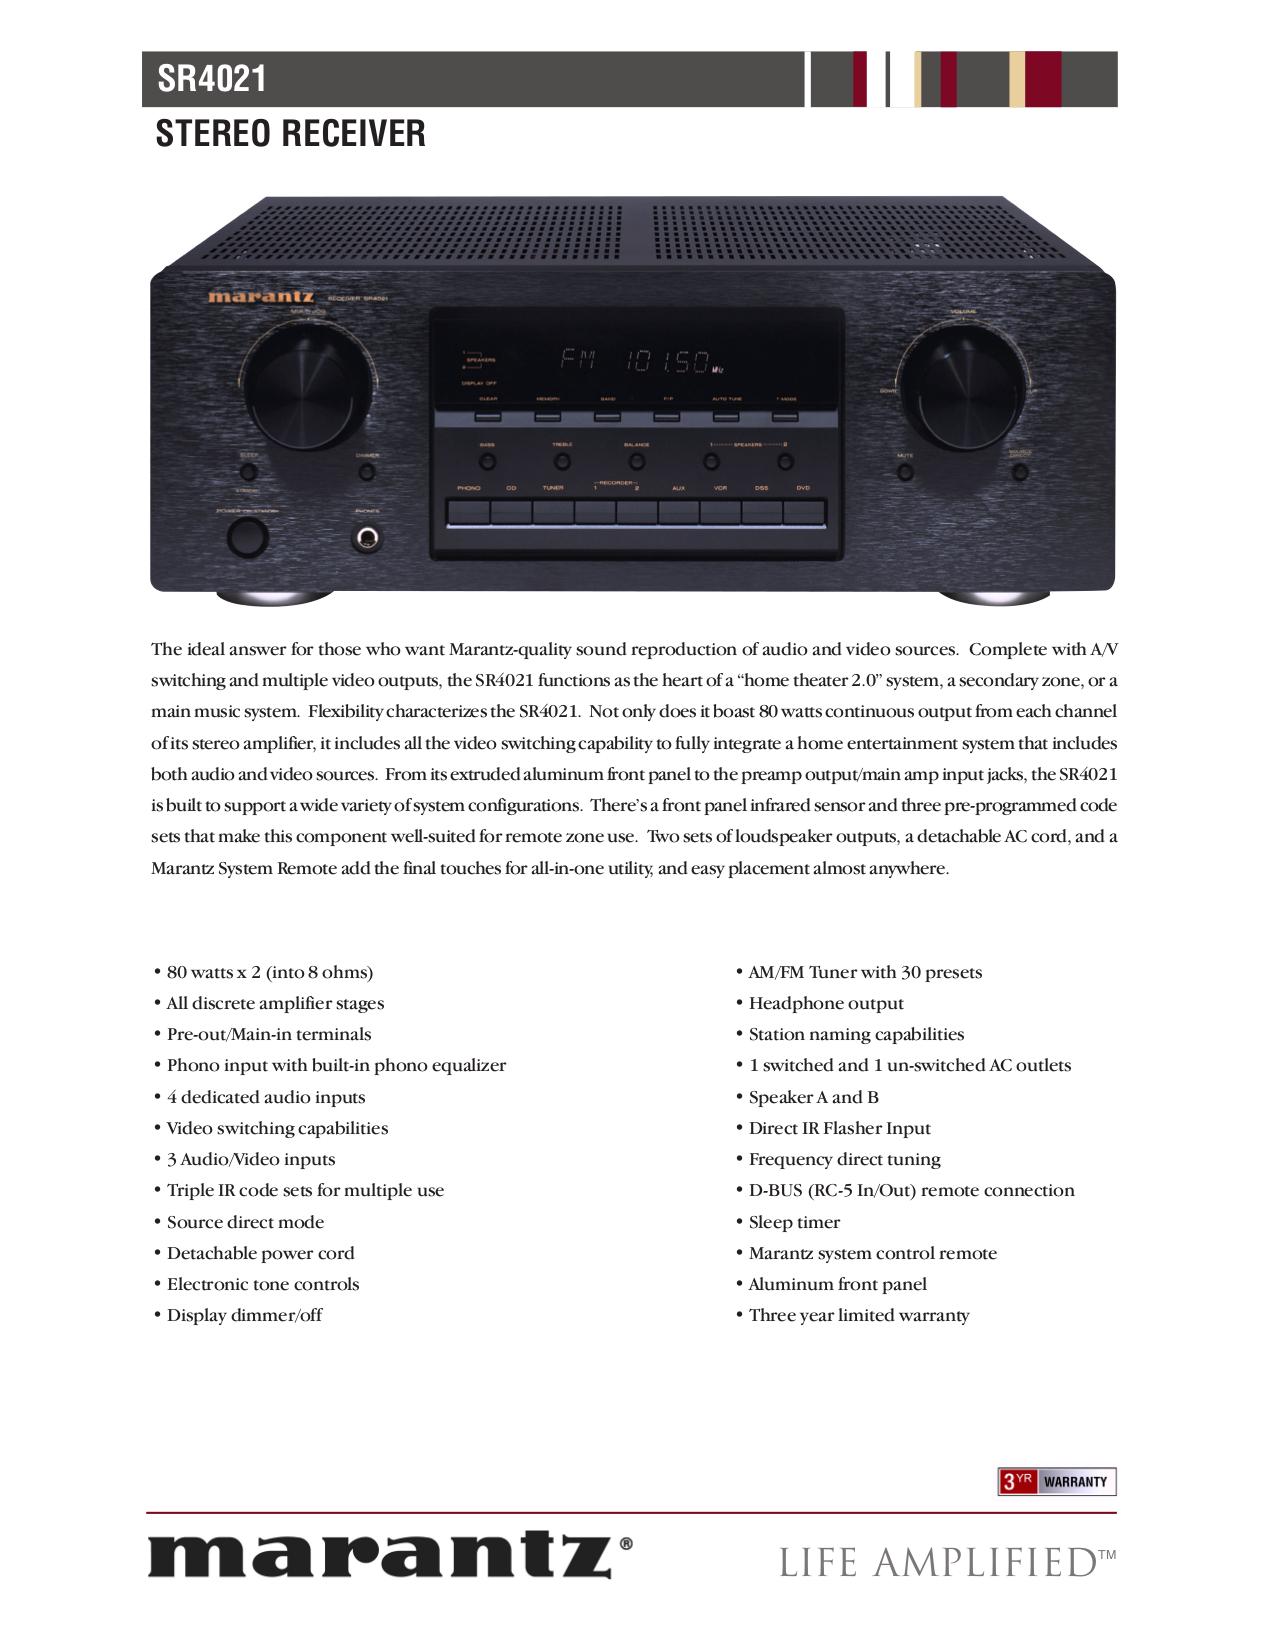 Marantz sr5001 manual ebook pdf for marantz receiver sr4021 manual fandeluxe Gallery